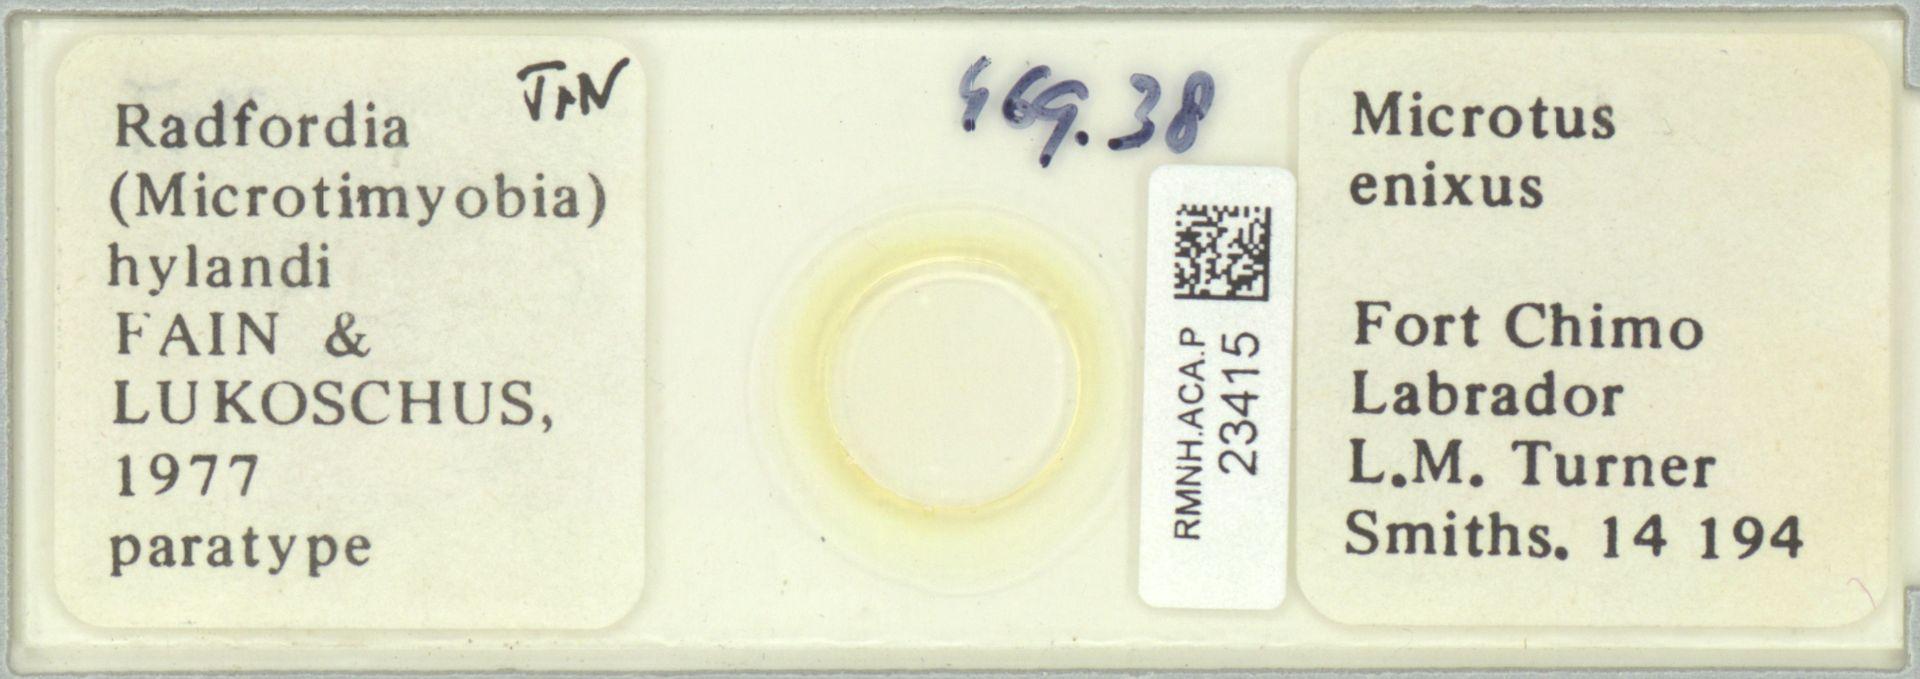 RMNH.ACA.P.23415 | Radfordia (Microtimyobia) hylandi Fain & Lukoschus, 1977